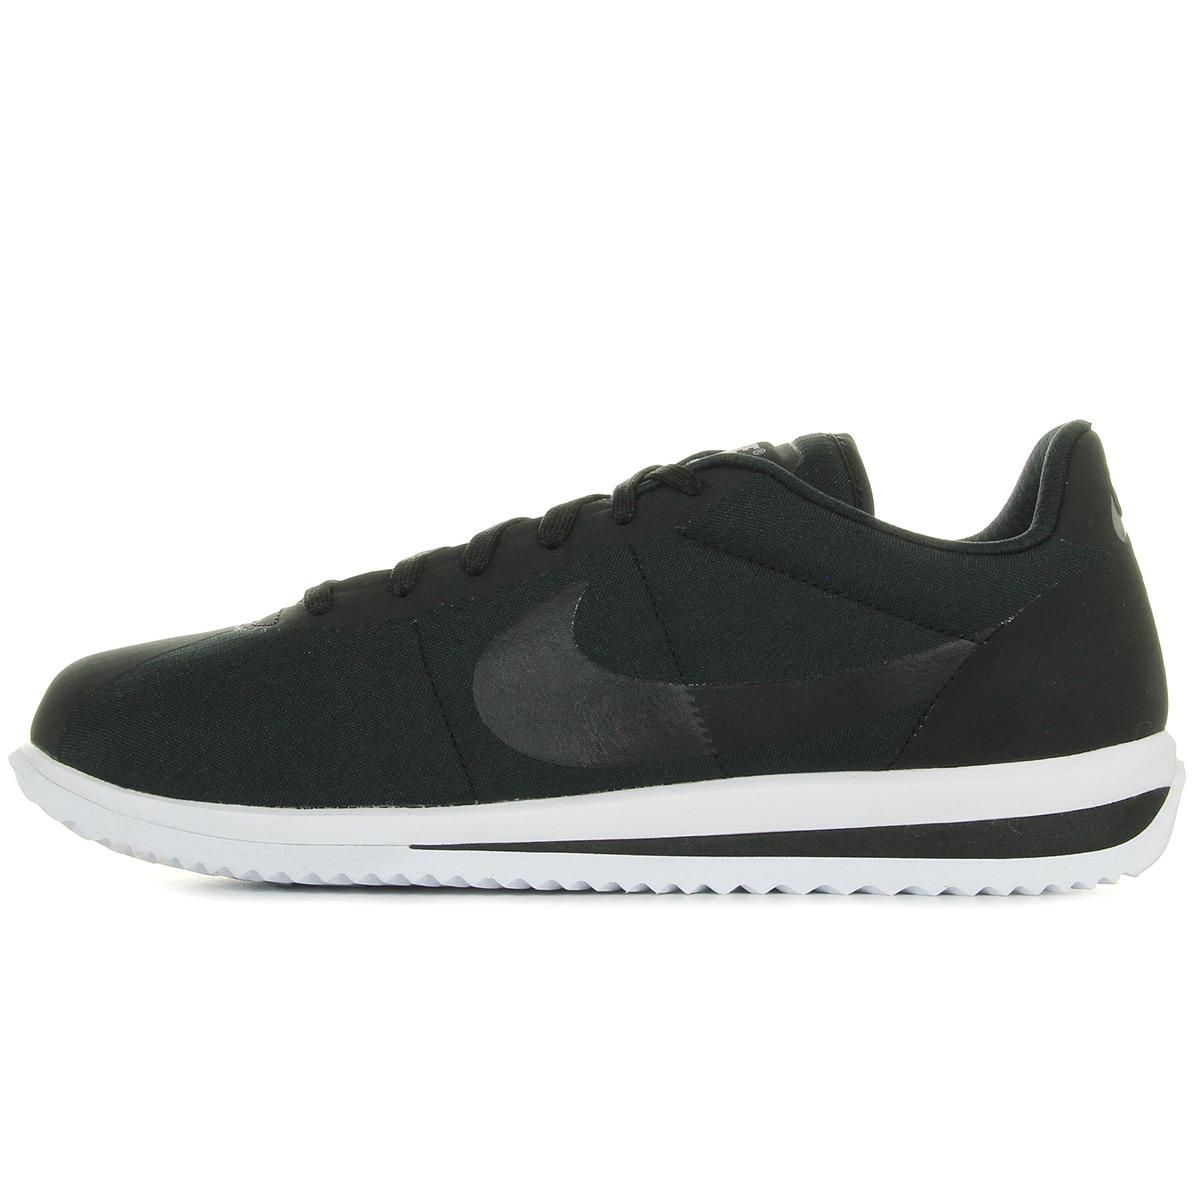 Nike Cortez Ultra 833142005, Baskets mode homme